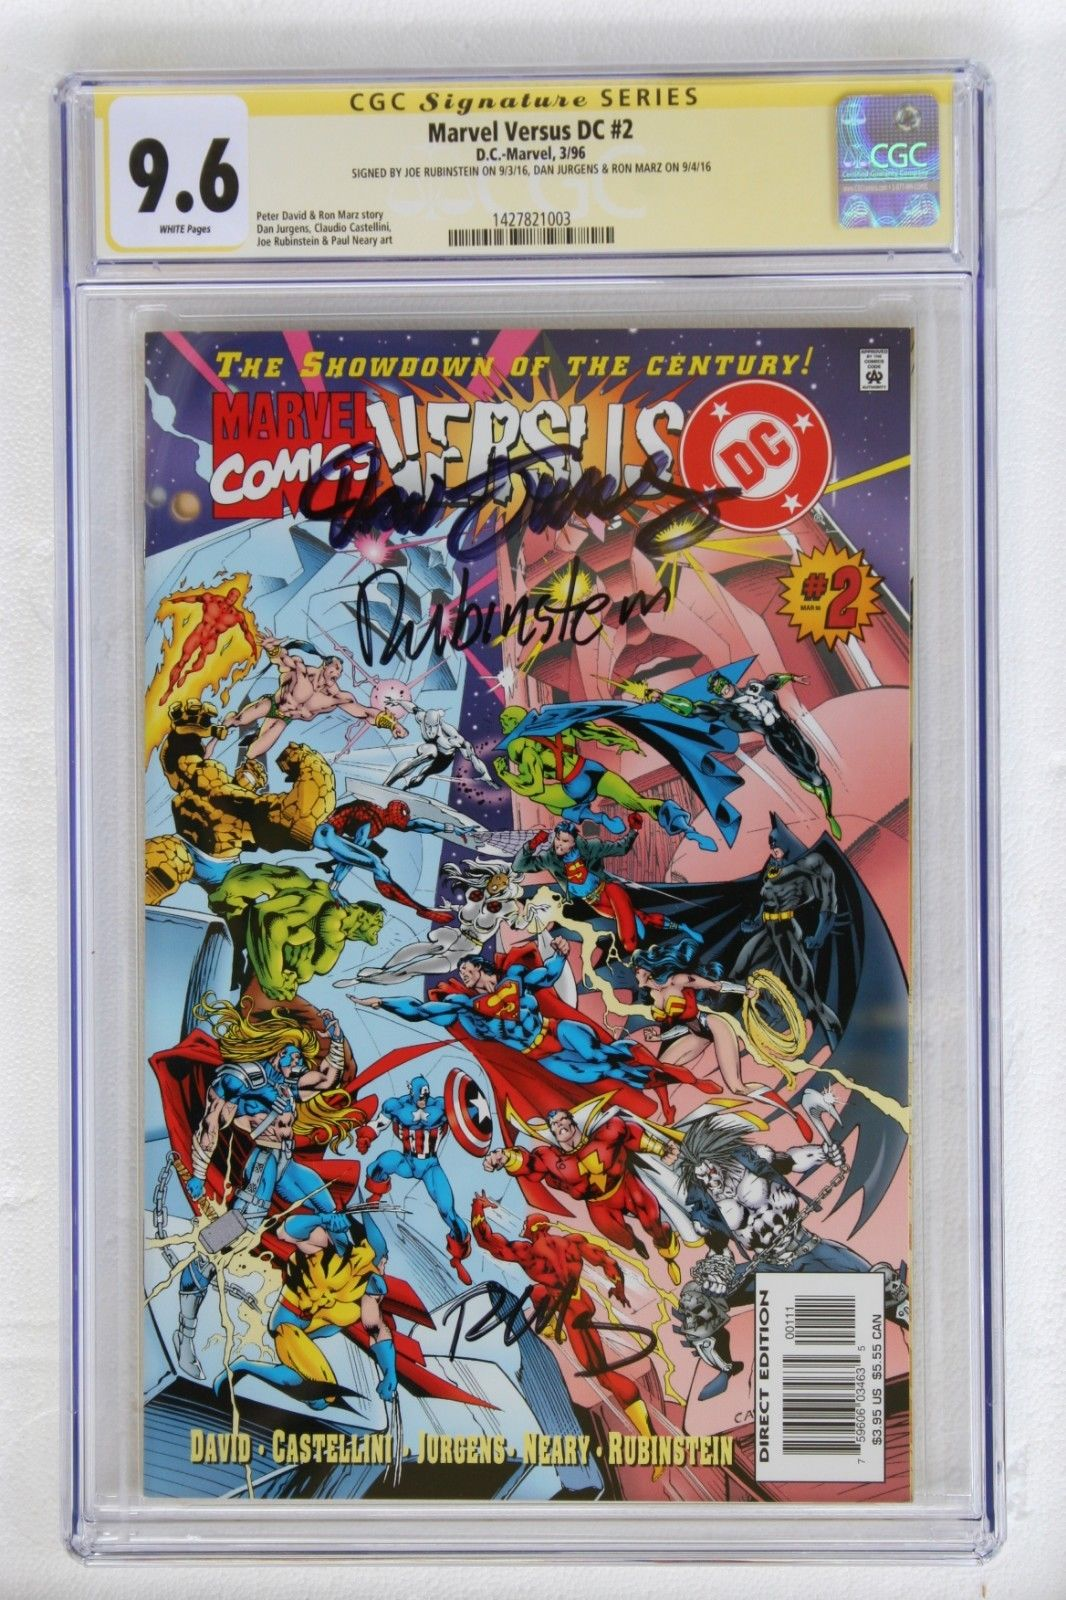 Marvel Versus DC 2 (SS CGC 9.6) NM+ x3 Rubinstein, Jurgens, Marz (1427821003) $8